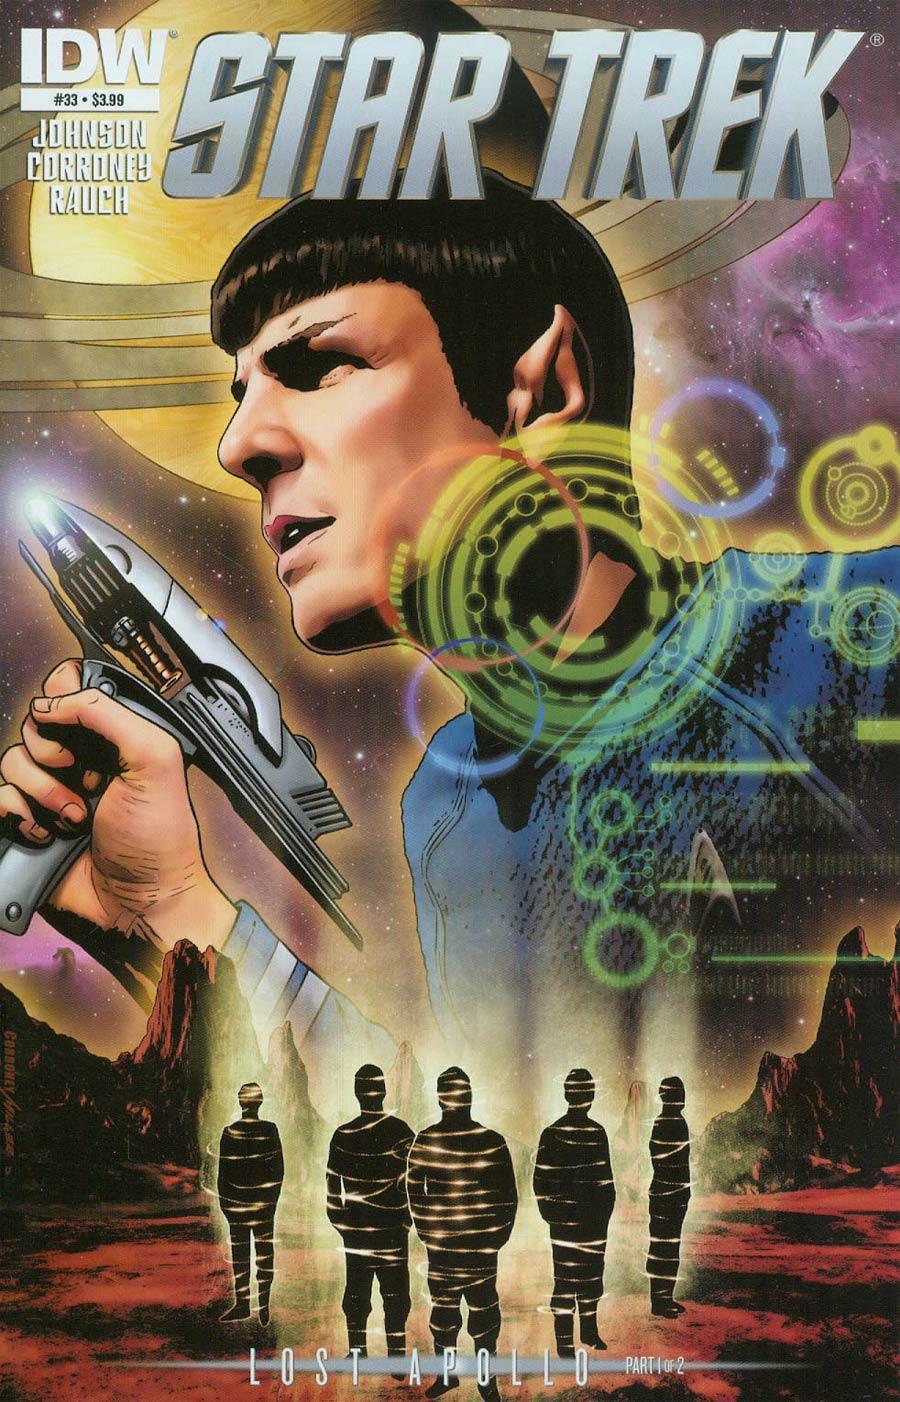 Star Trek (IDW) #33 Cover A Regular Joe Corroney Cover